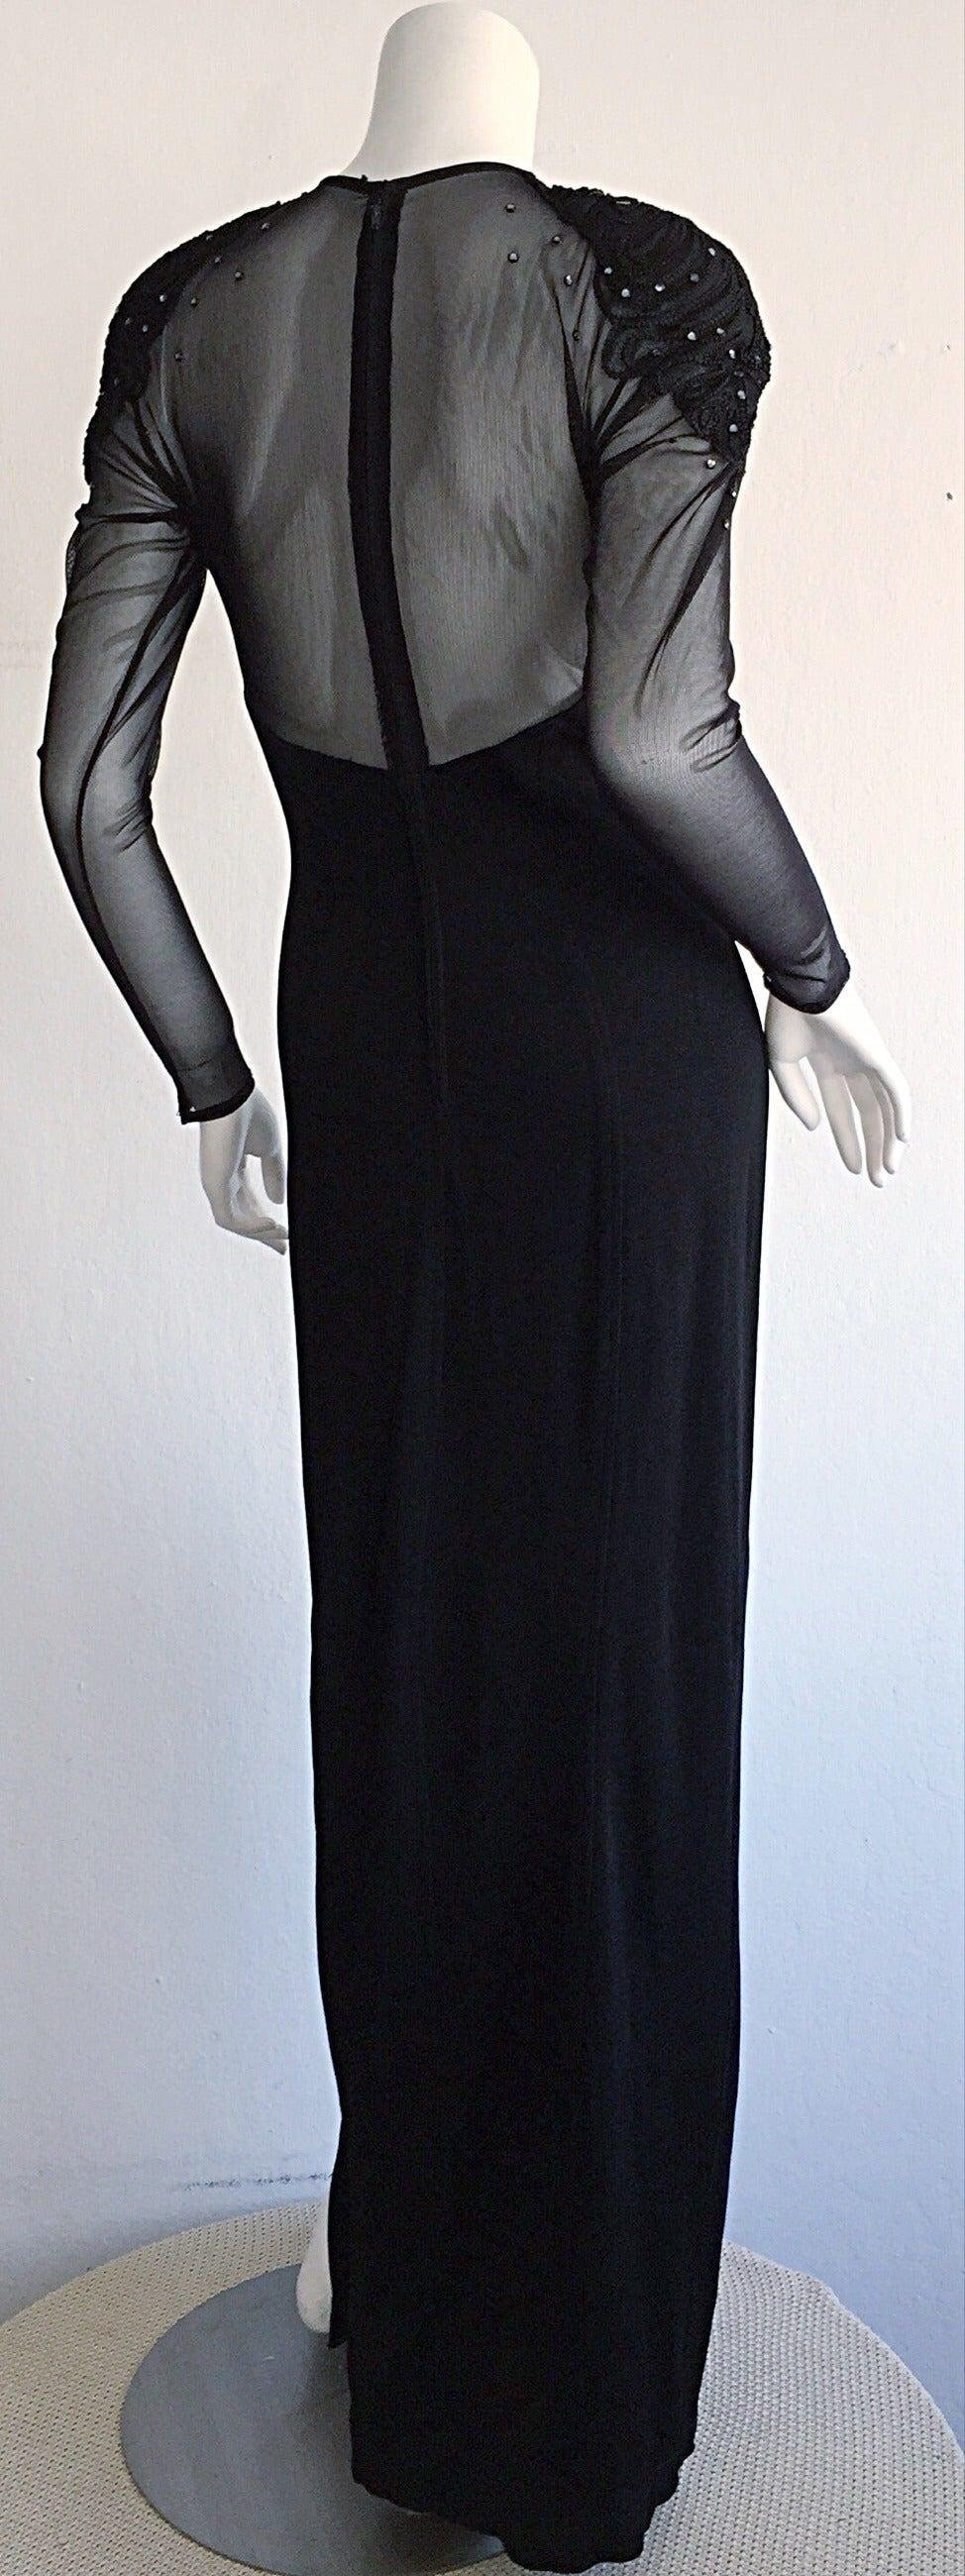 Sexy Vintage 1990s Black Cut - Out Bodycon Dress w/ Rhinestones 4